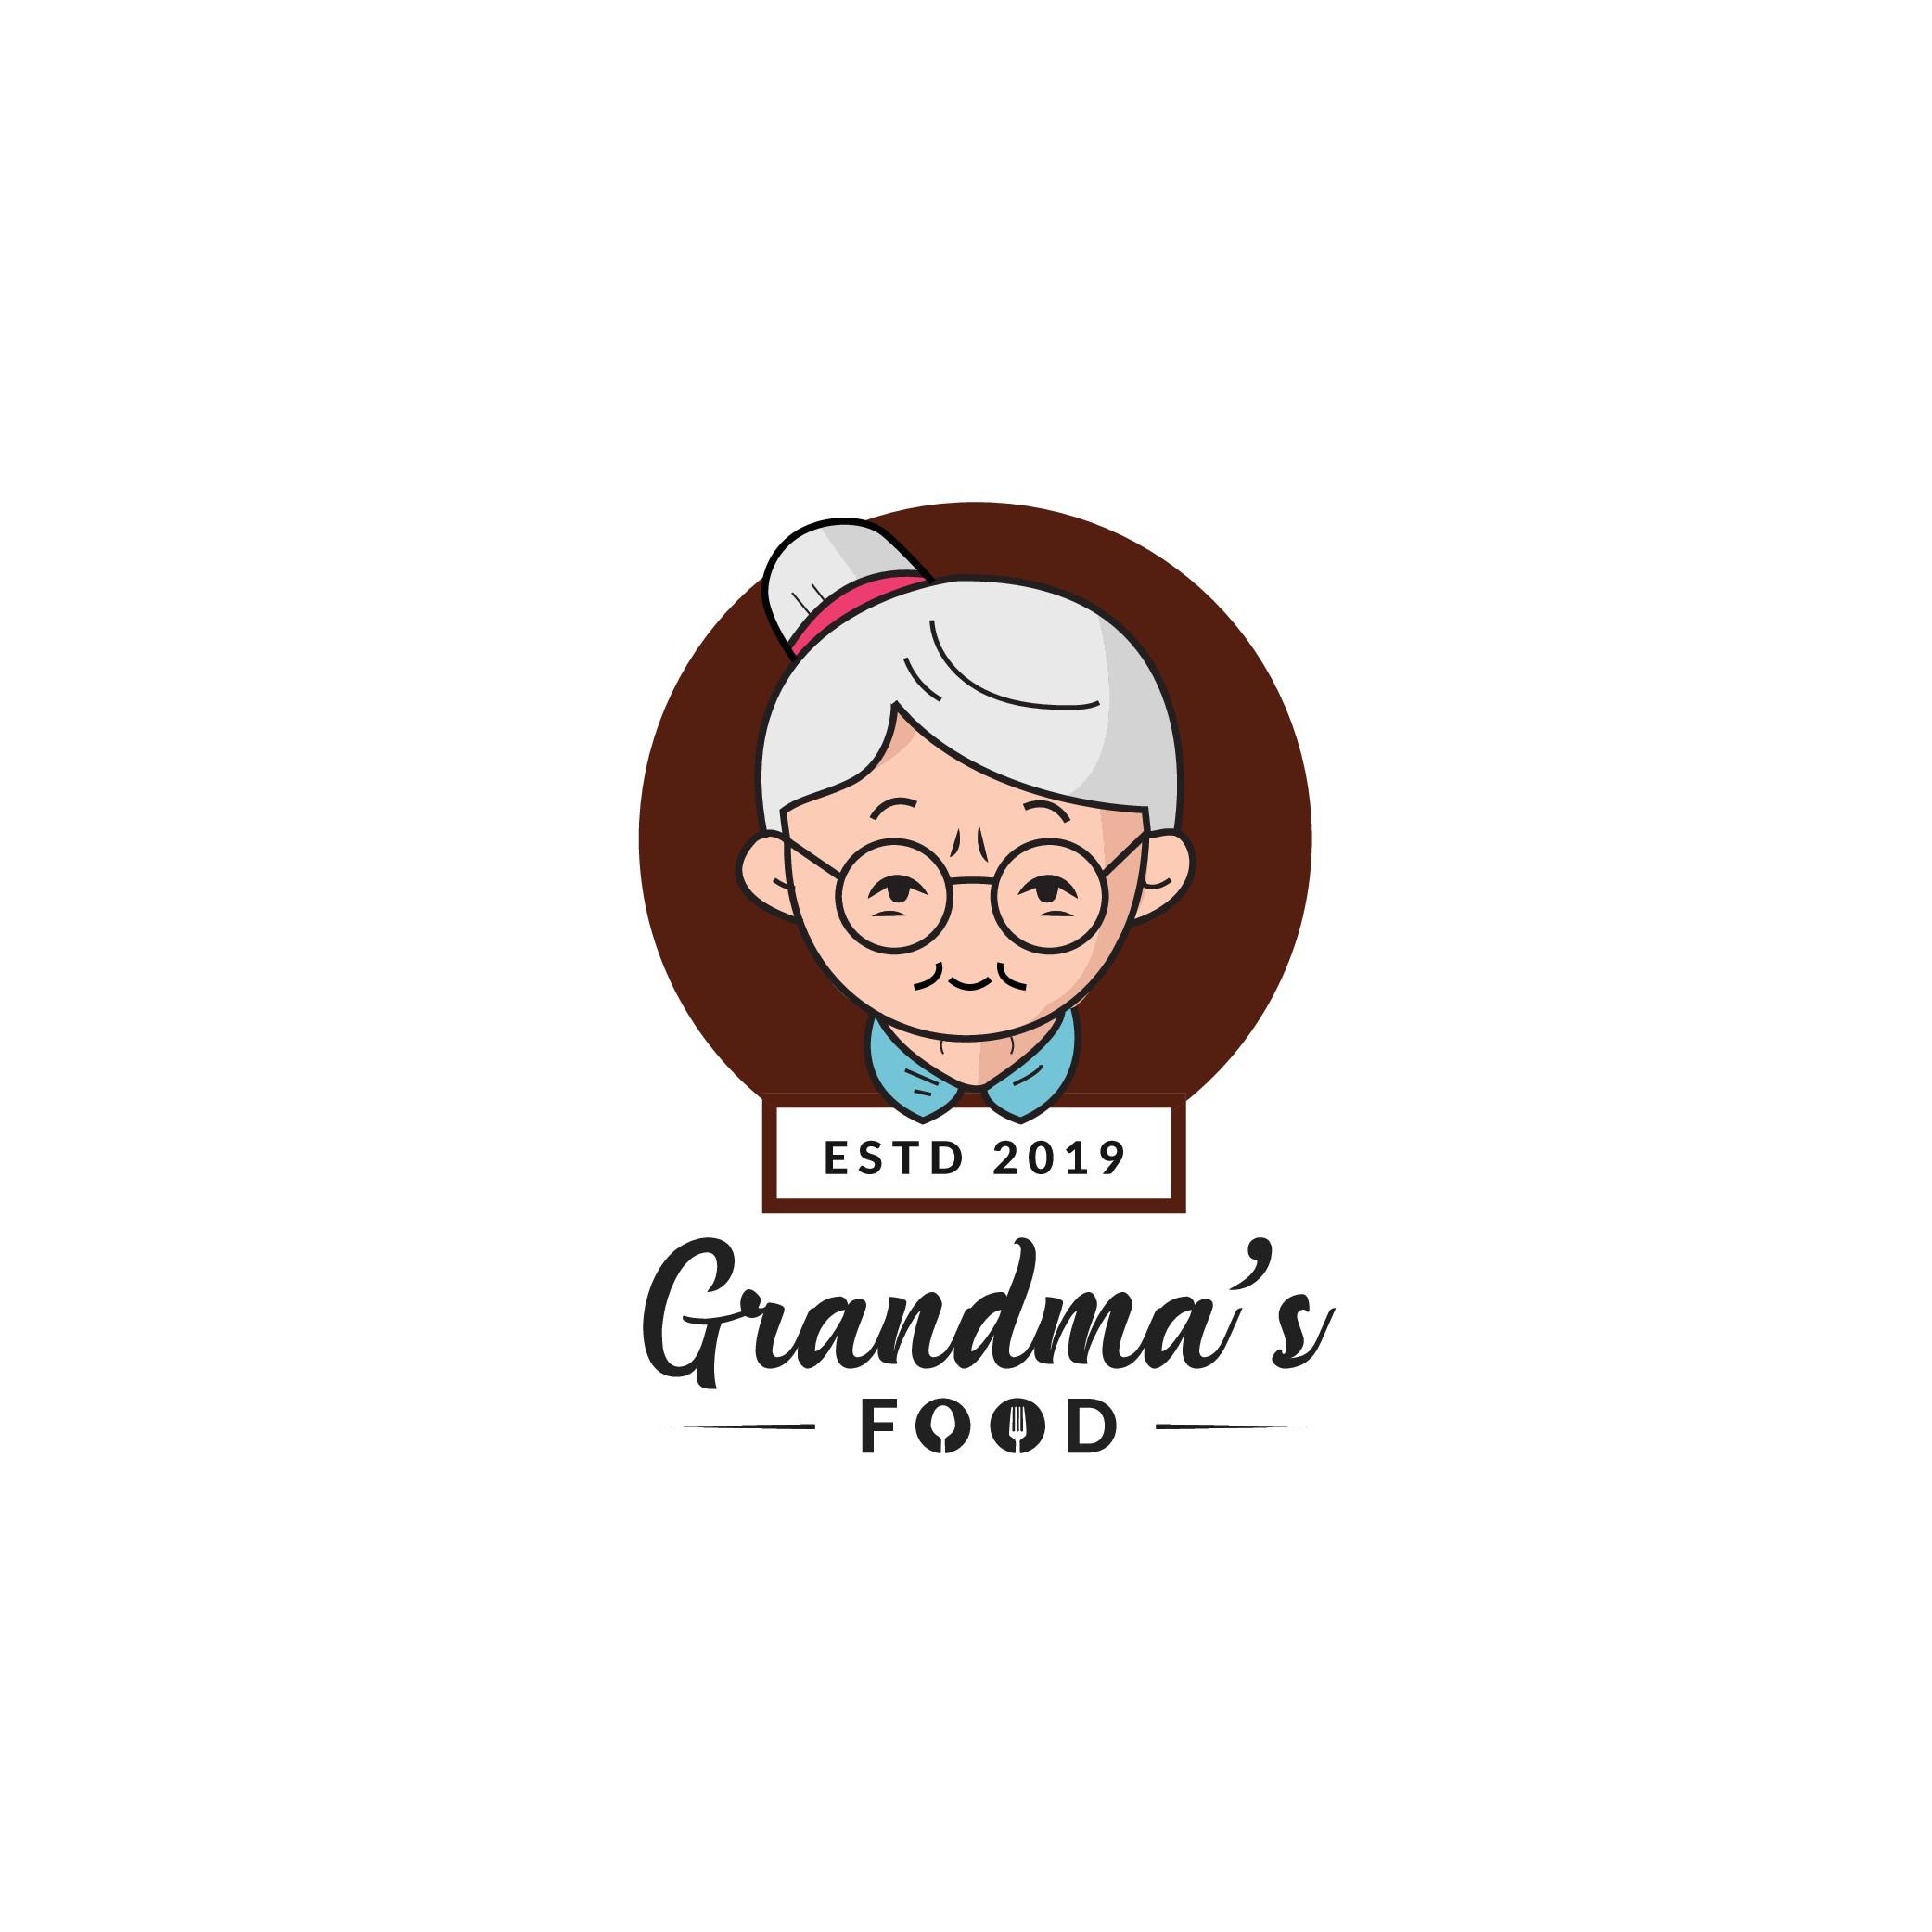 Grandma's restaurant needs a delicious logo